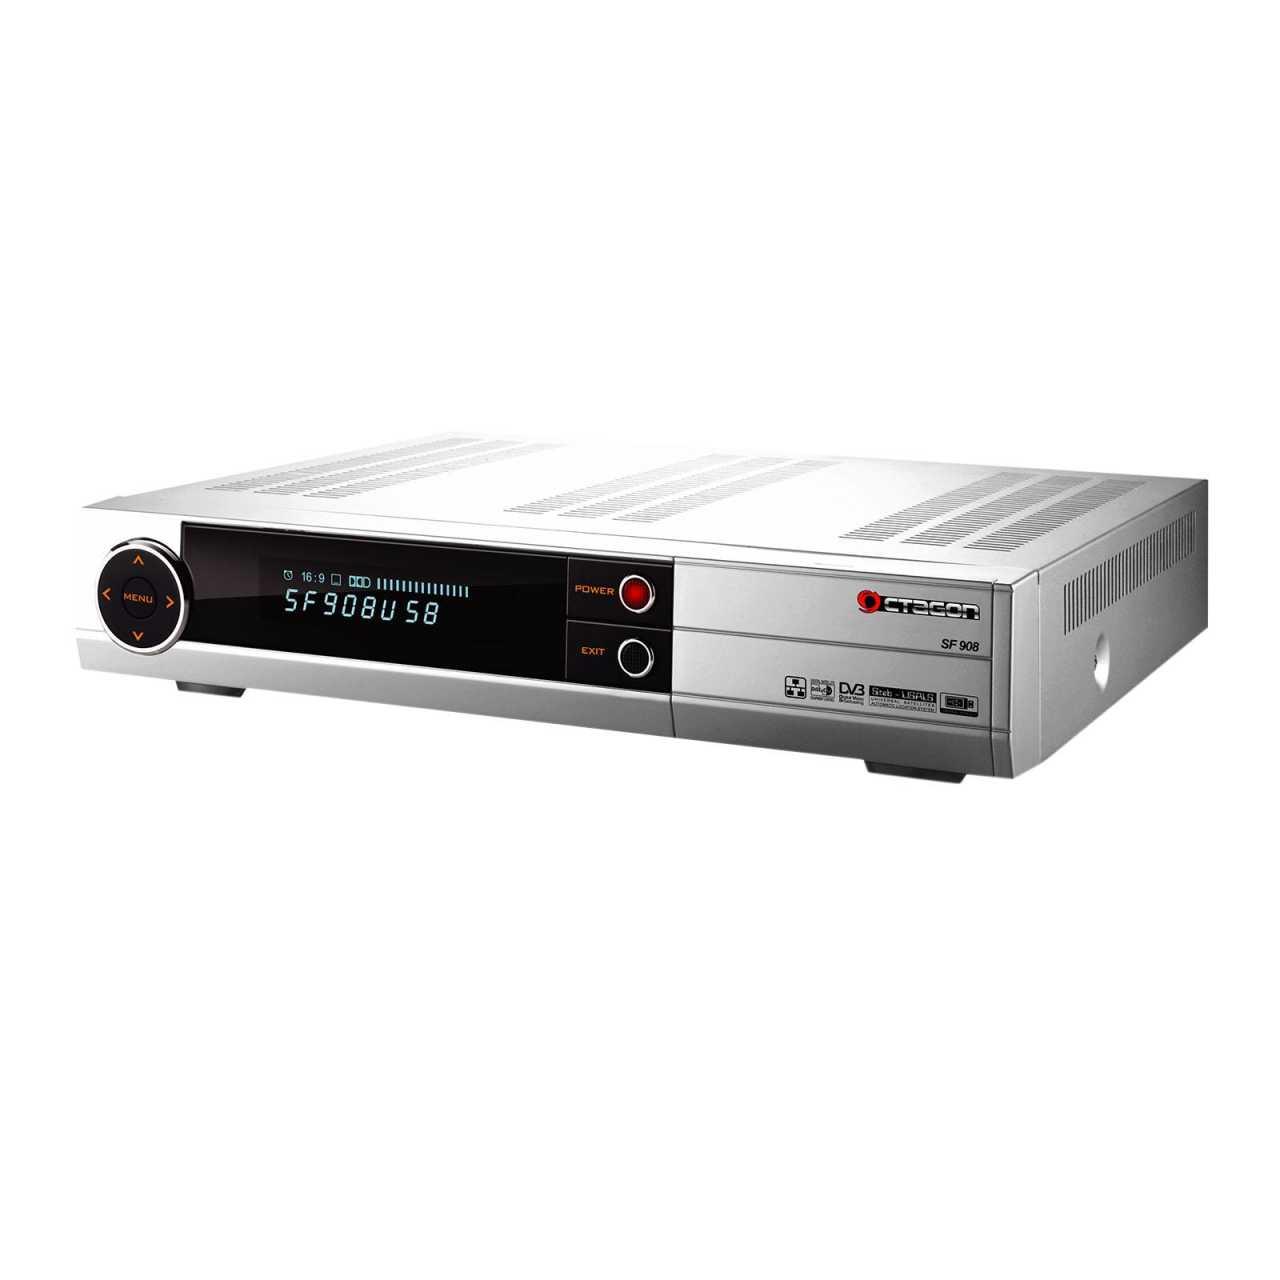 Octagon SF908 SD CI-Schacht, PVR, USB, 2x Scart Digitaler Satelliten-Receiver Silber RECOCT-014